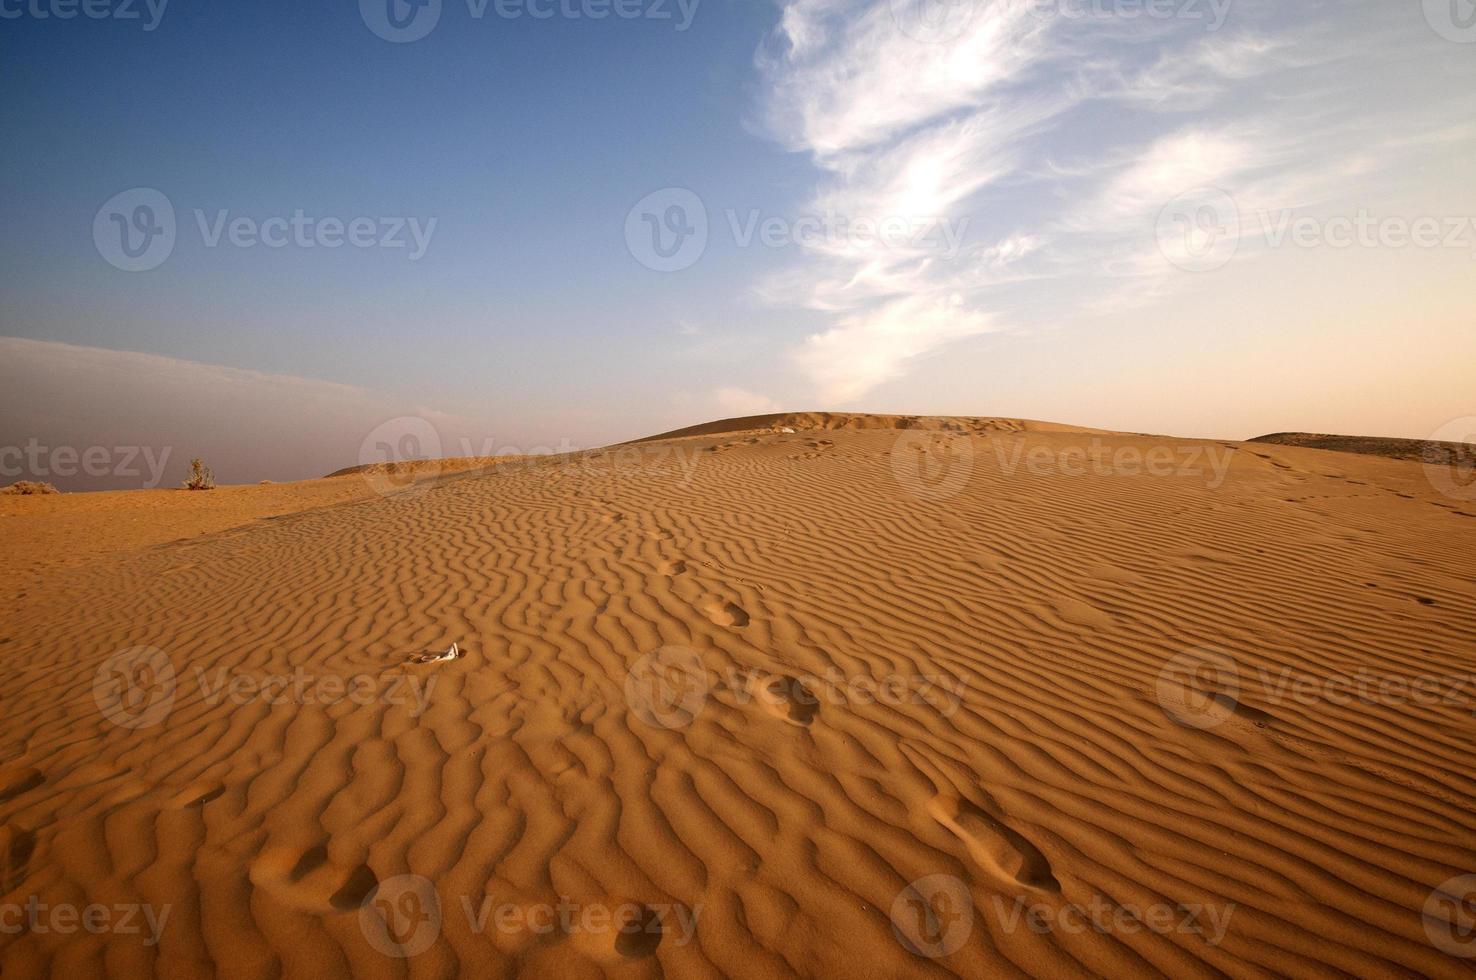 Rippled sand dunes at sunset photo